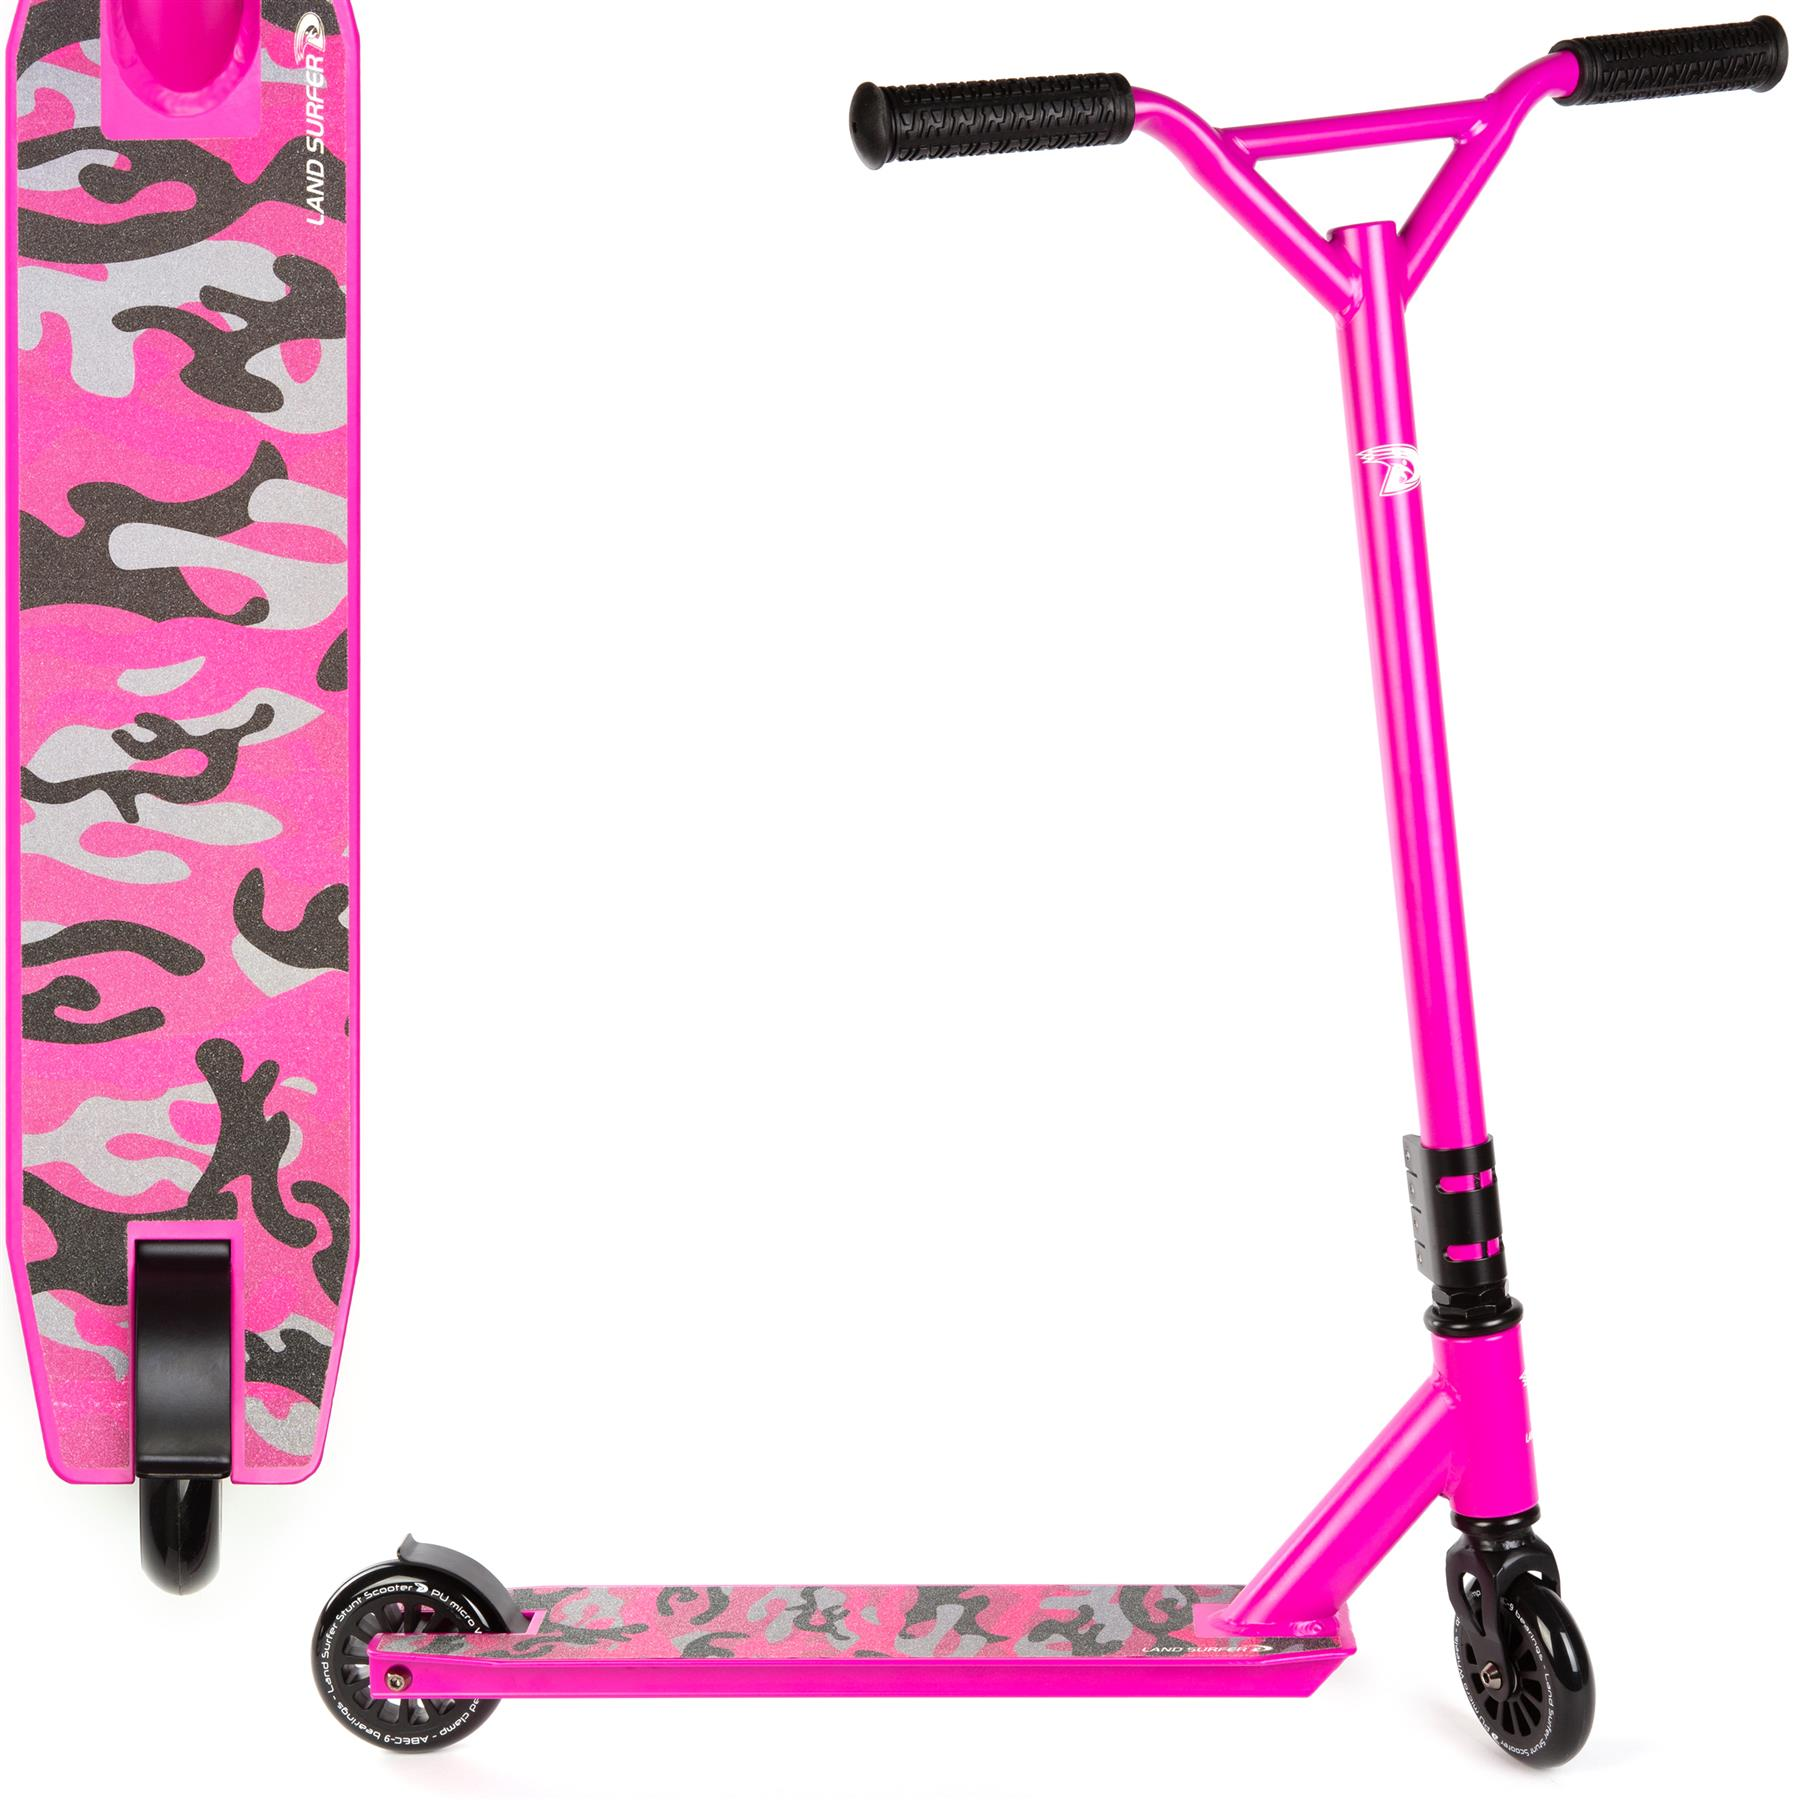 Land Surfer Stunt Scooter – Pink Camo